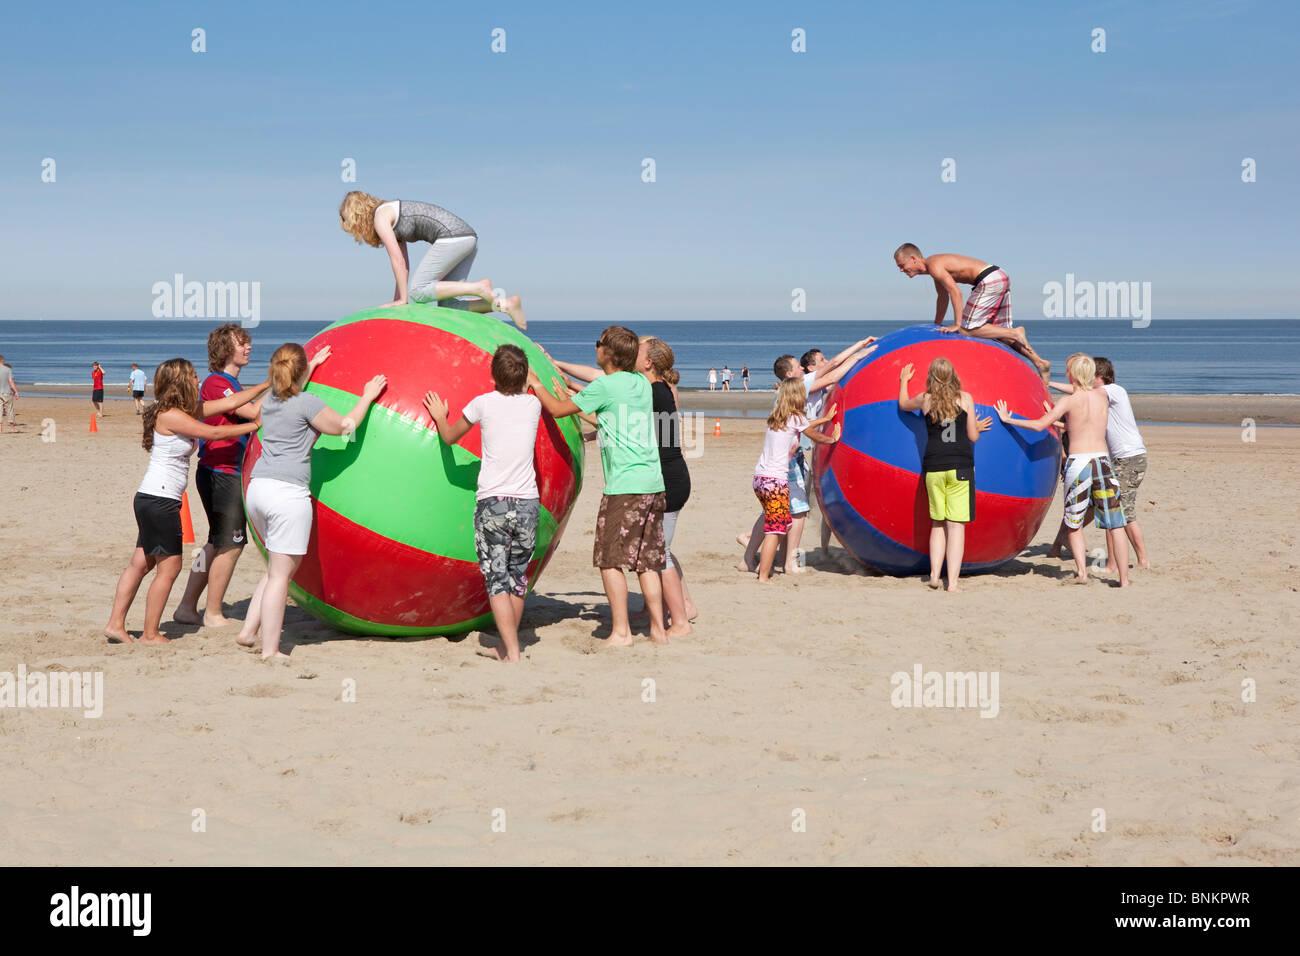 Teilnahme an Sportkursen am Strand Stockbild